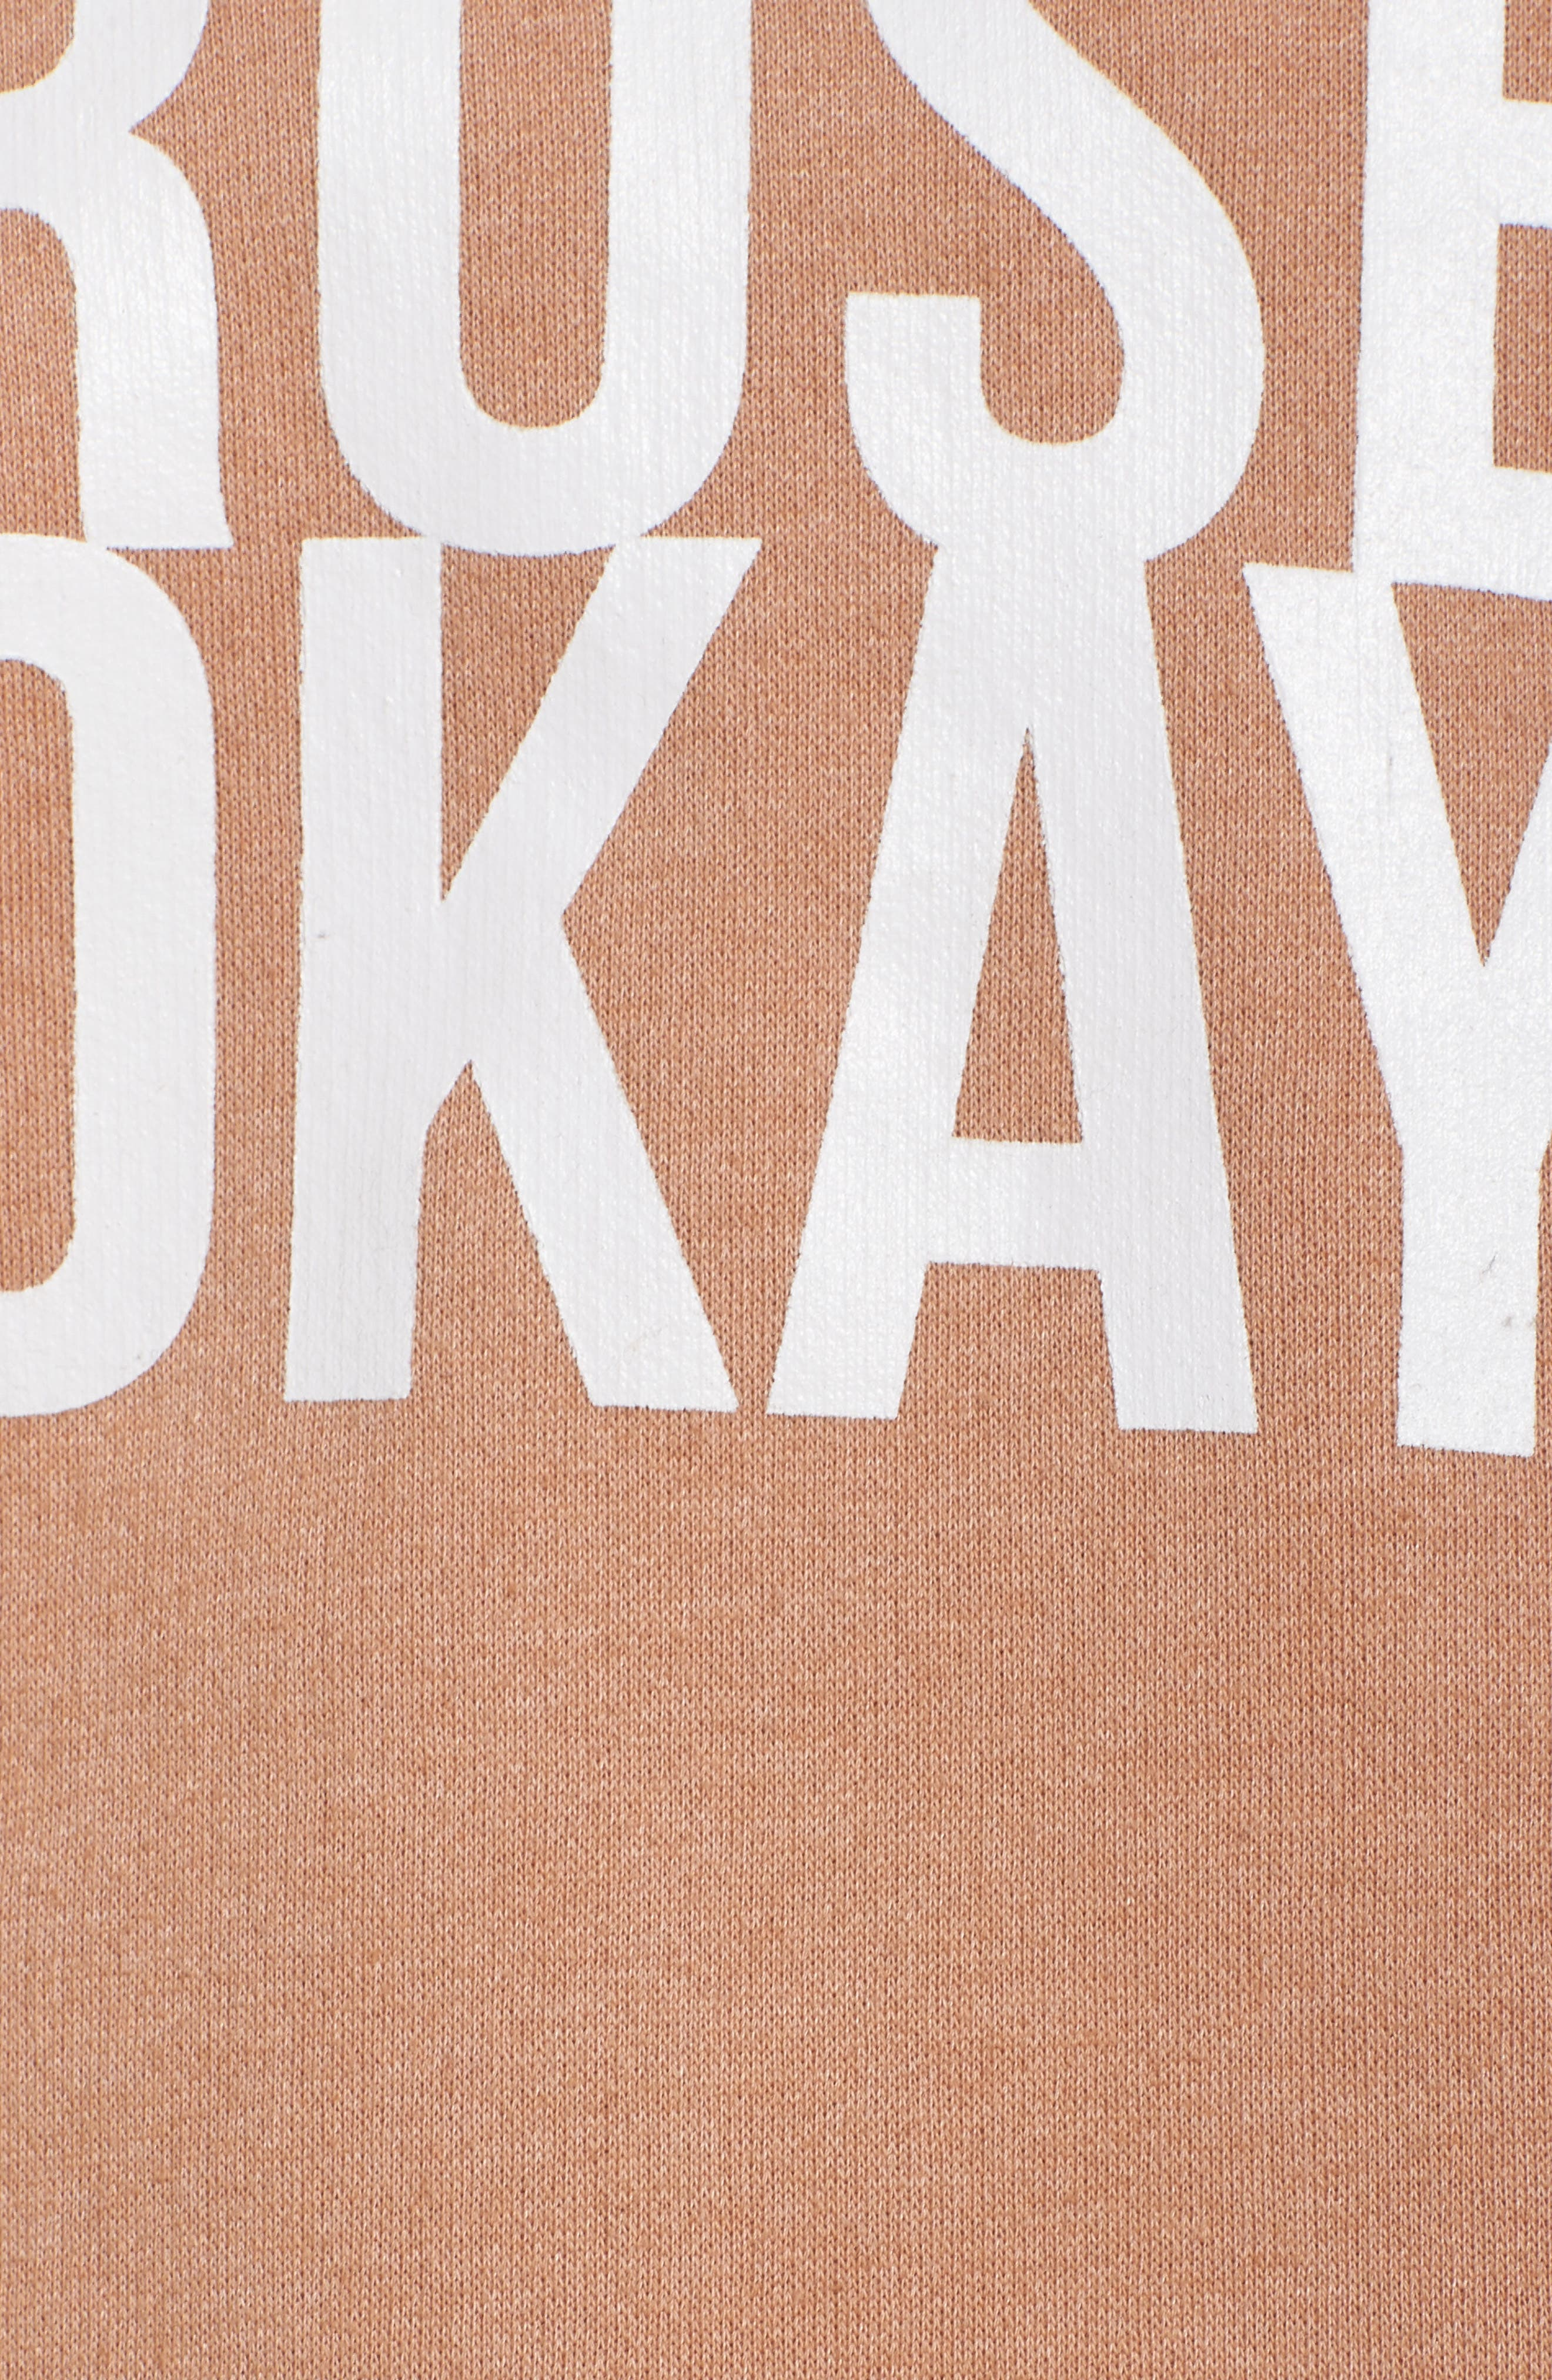 Rosé Okay Sweatshirt,                             Alternate thumbnail 5, color,                             Beige